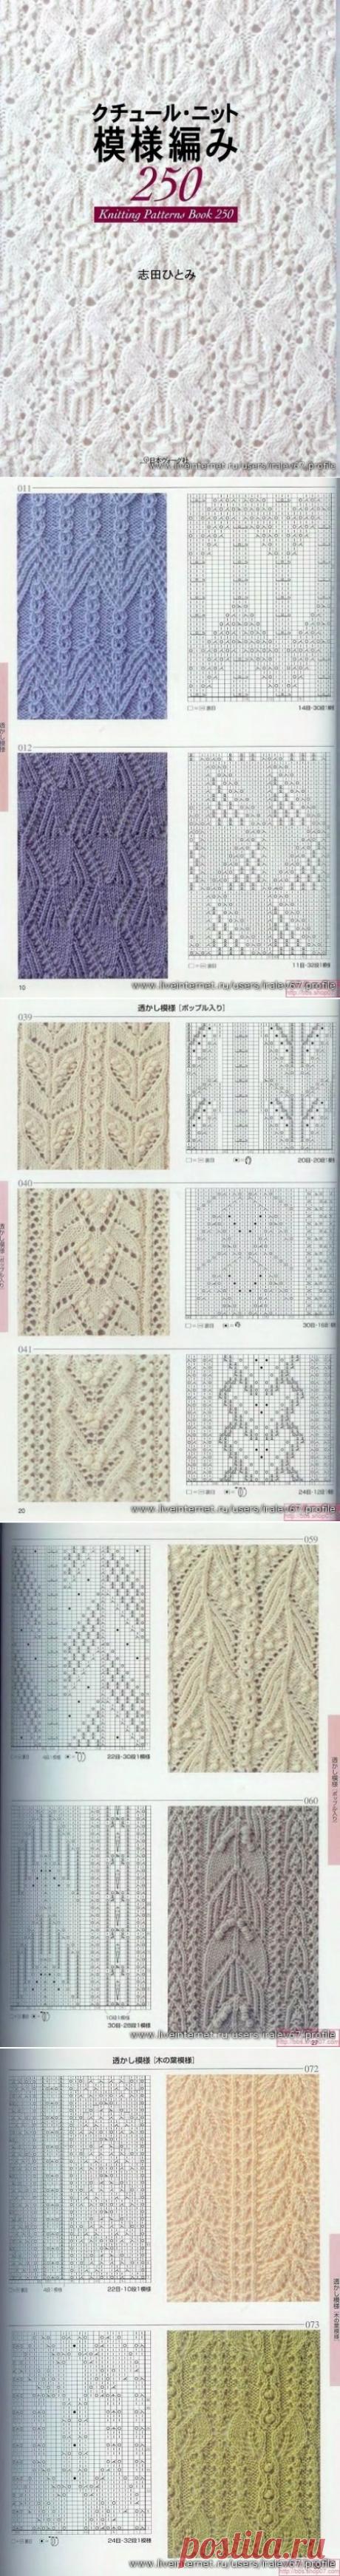 Knitting patterns book 250 (Узоры по вязанию спицами и крючком)